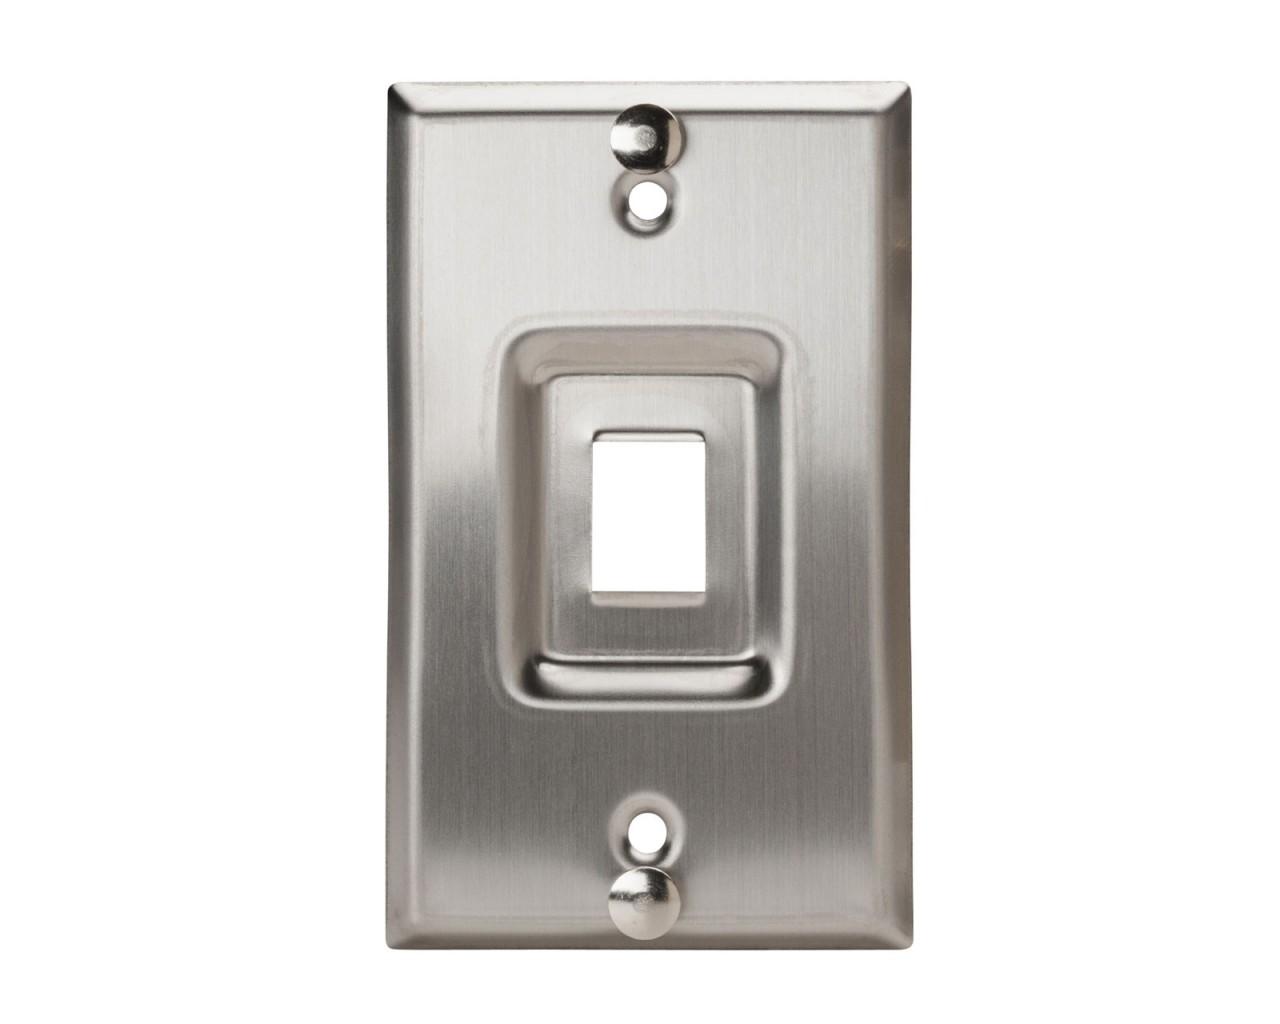 Wall Phone Stainless Steel Keystone Plate   New World Telecom Inc.